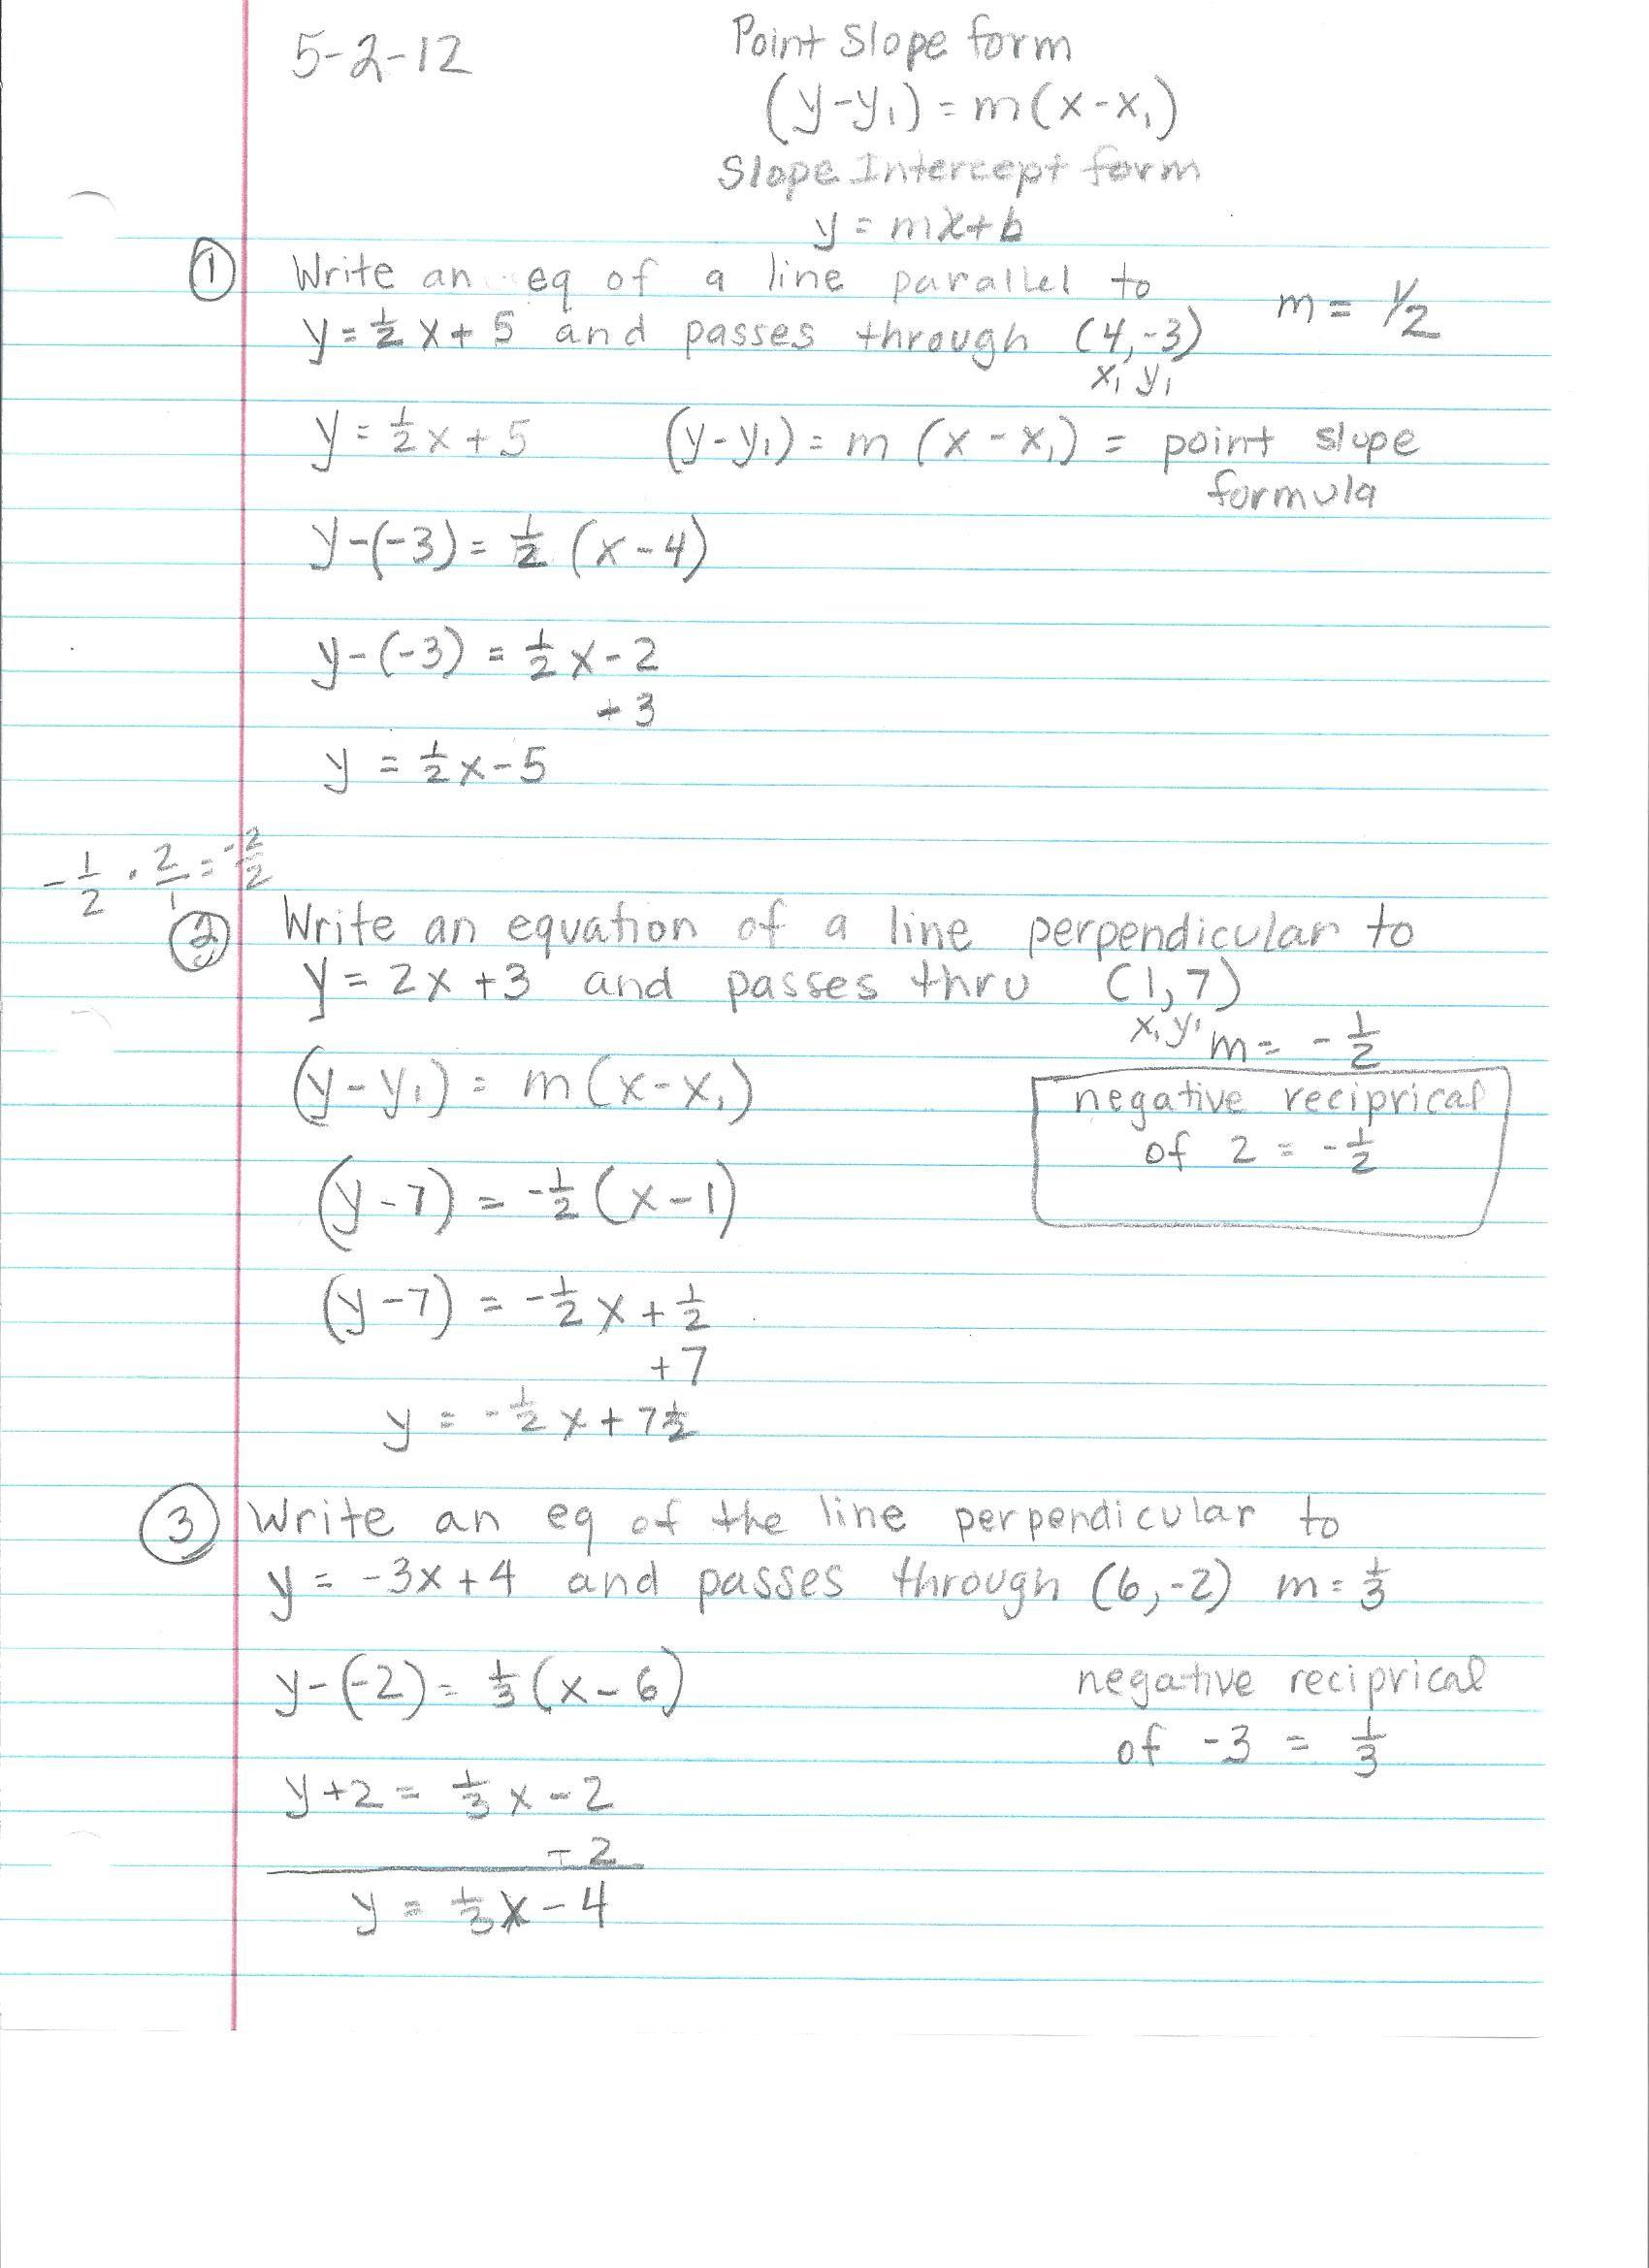 algebra 1 notes for 9th grade 8th grade algebra 1 notes. Black Bedroom Furniture Sets. Home Design Ideas